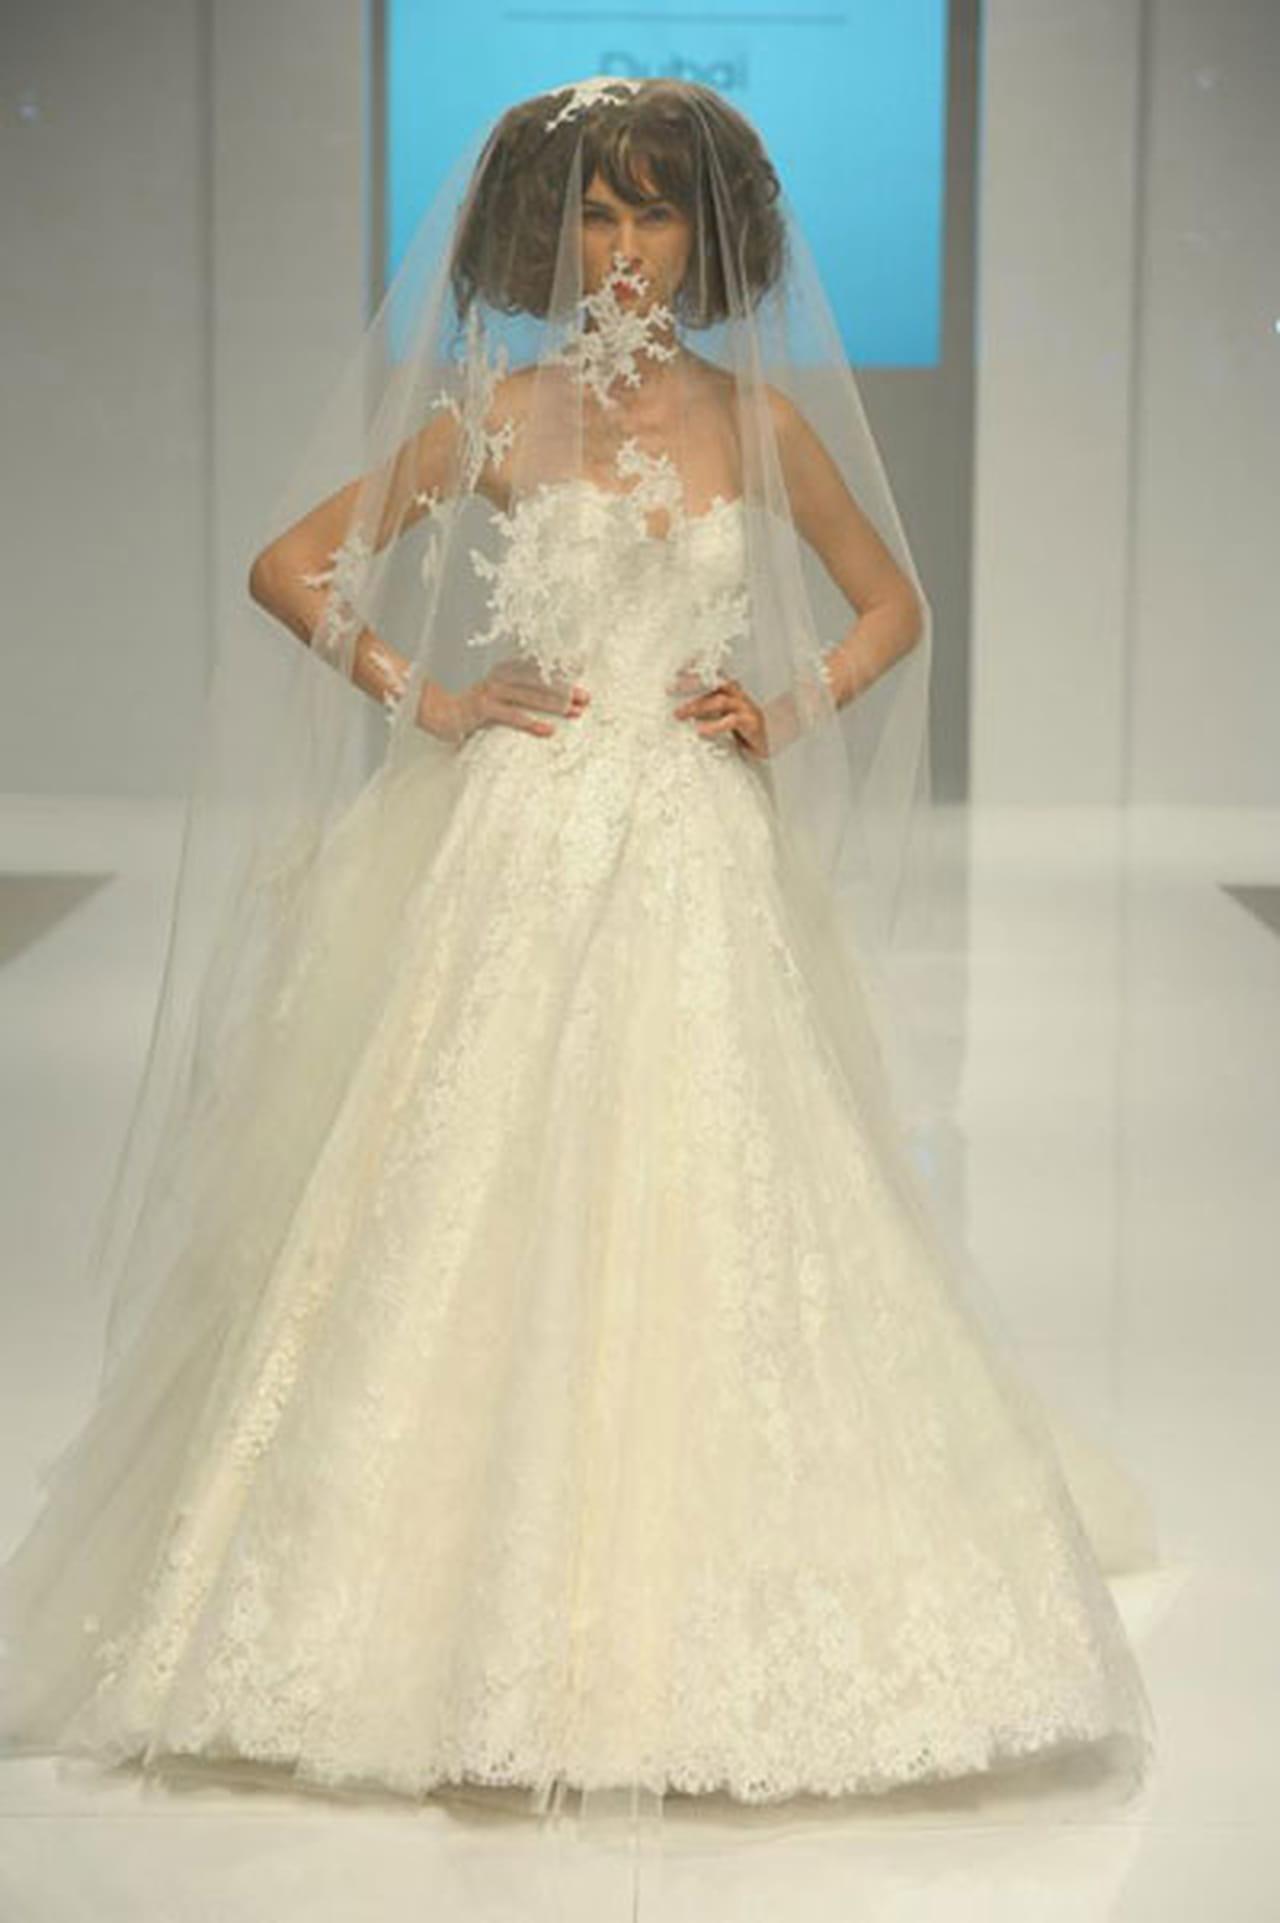 1d7b100cf جولة مع أروع فساتين زفاف معرض العروس دبي 2014